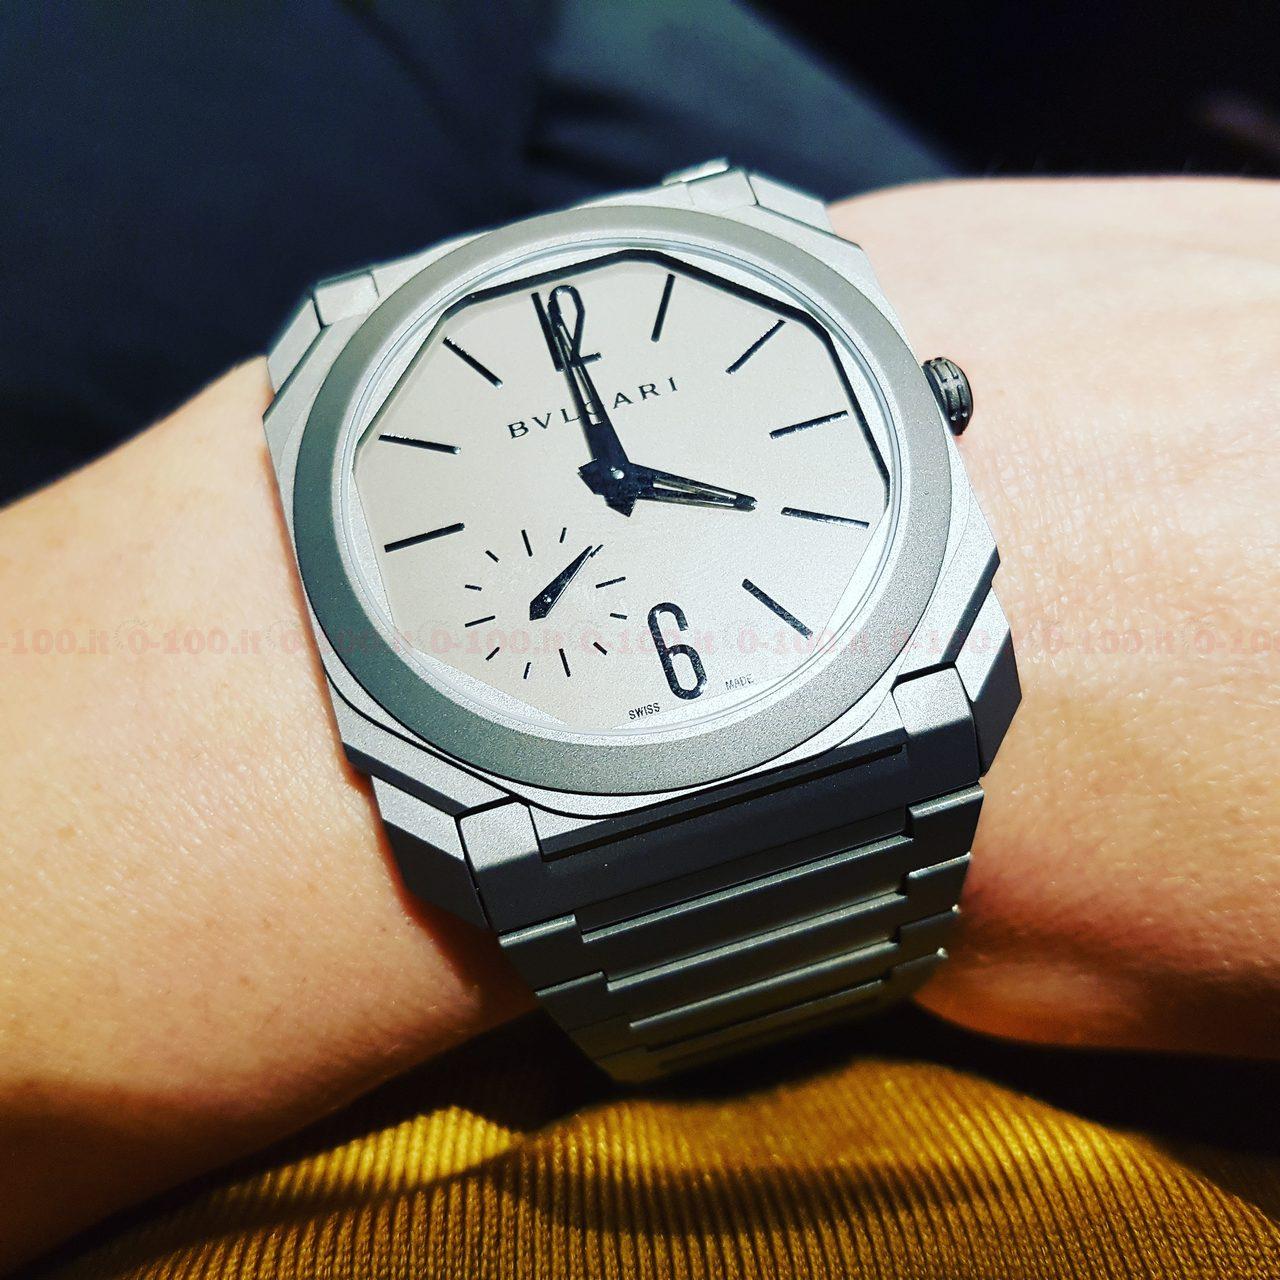 baselworld-2017-bulgari-octo-finissimo-automatic-titanium-prezzo-price_0-1001